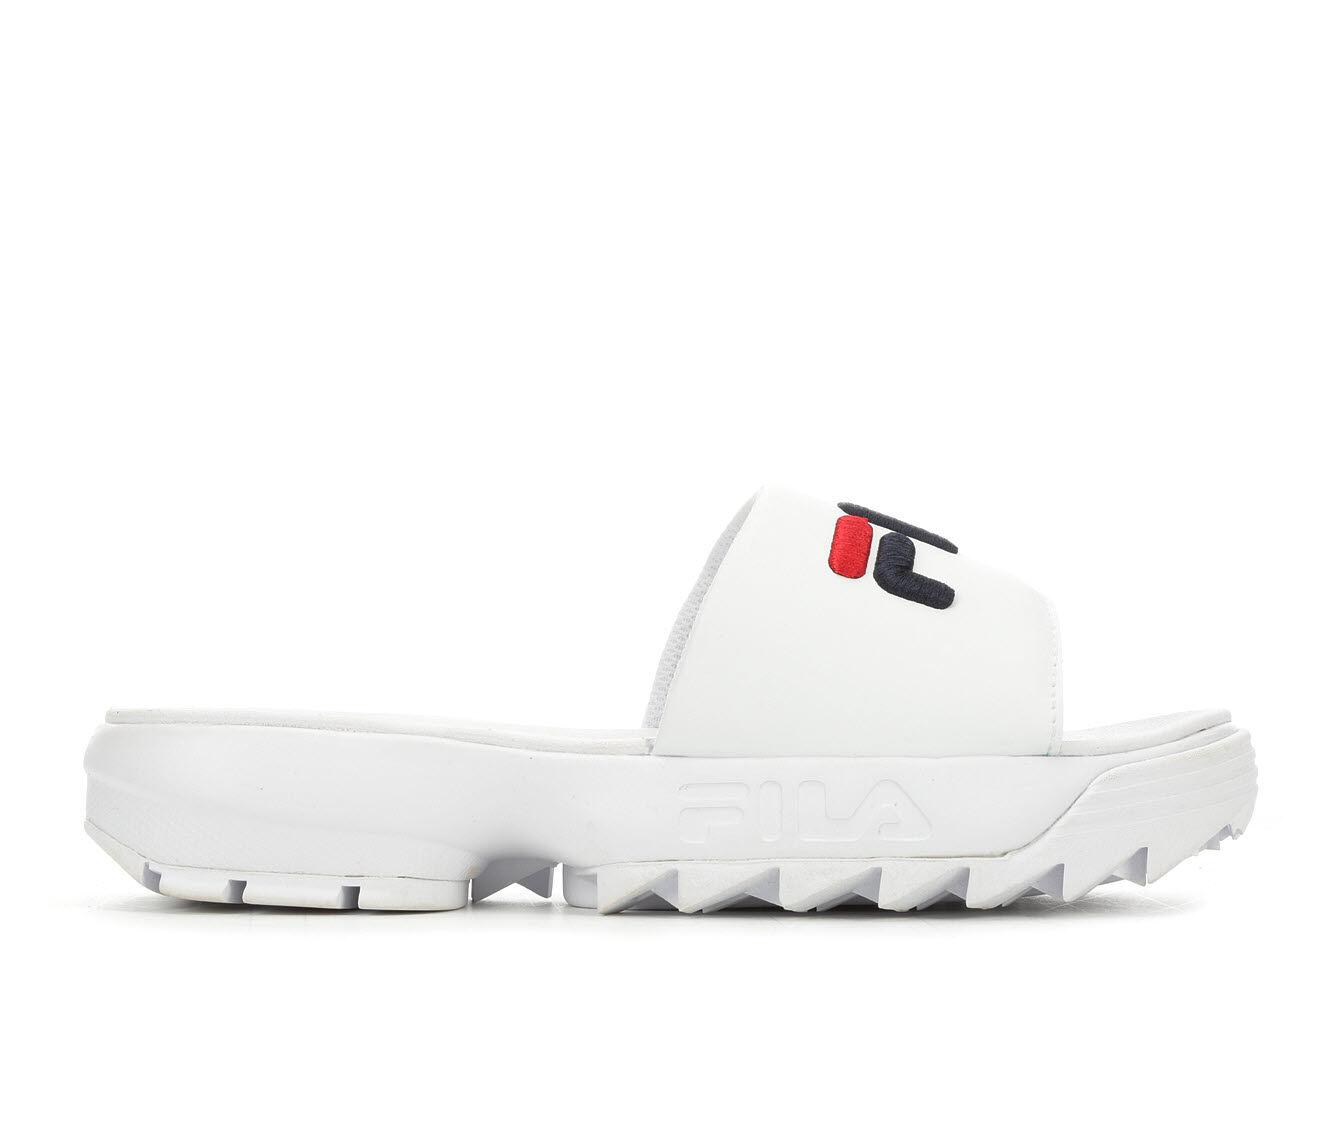 uk shoes_kd7118